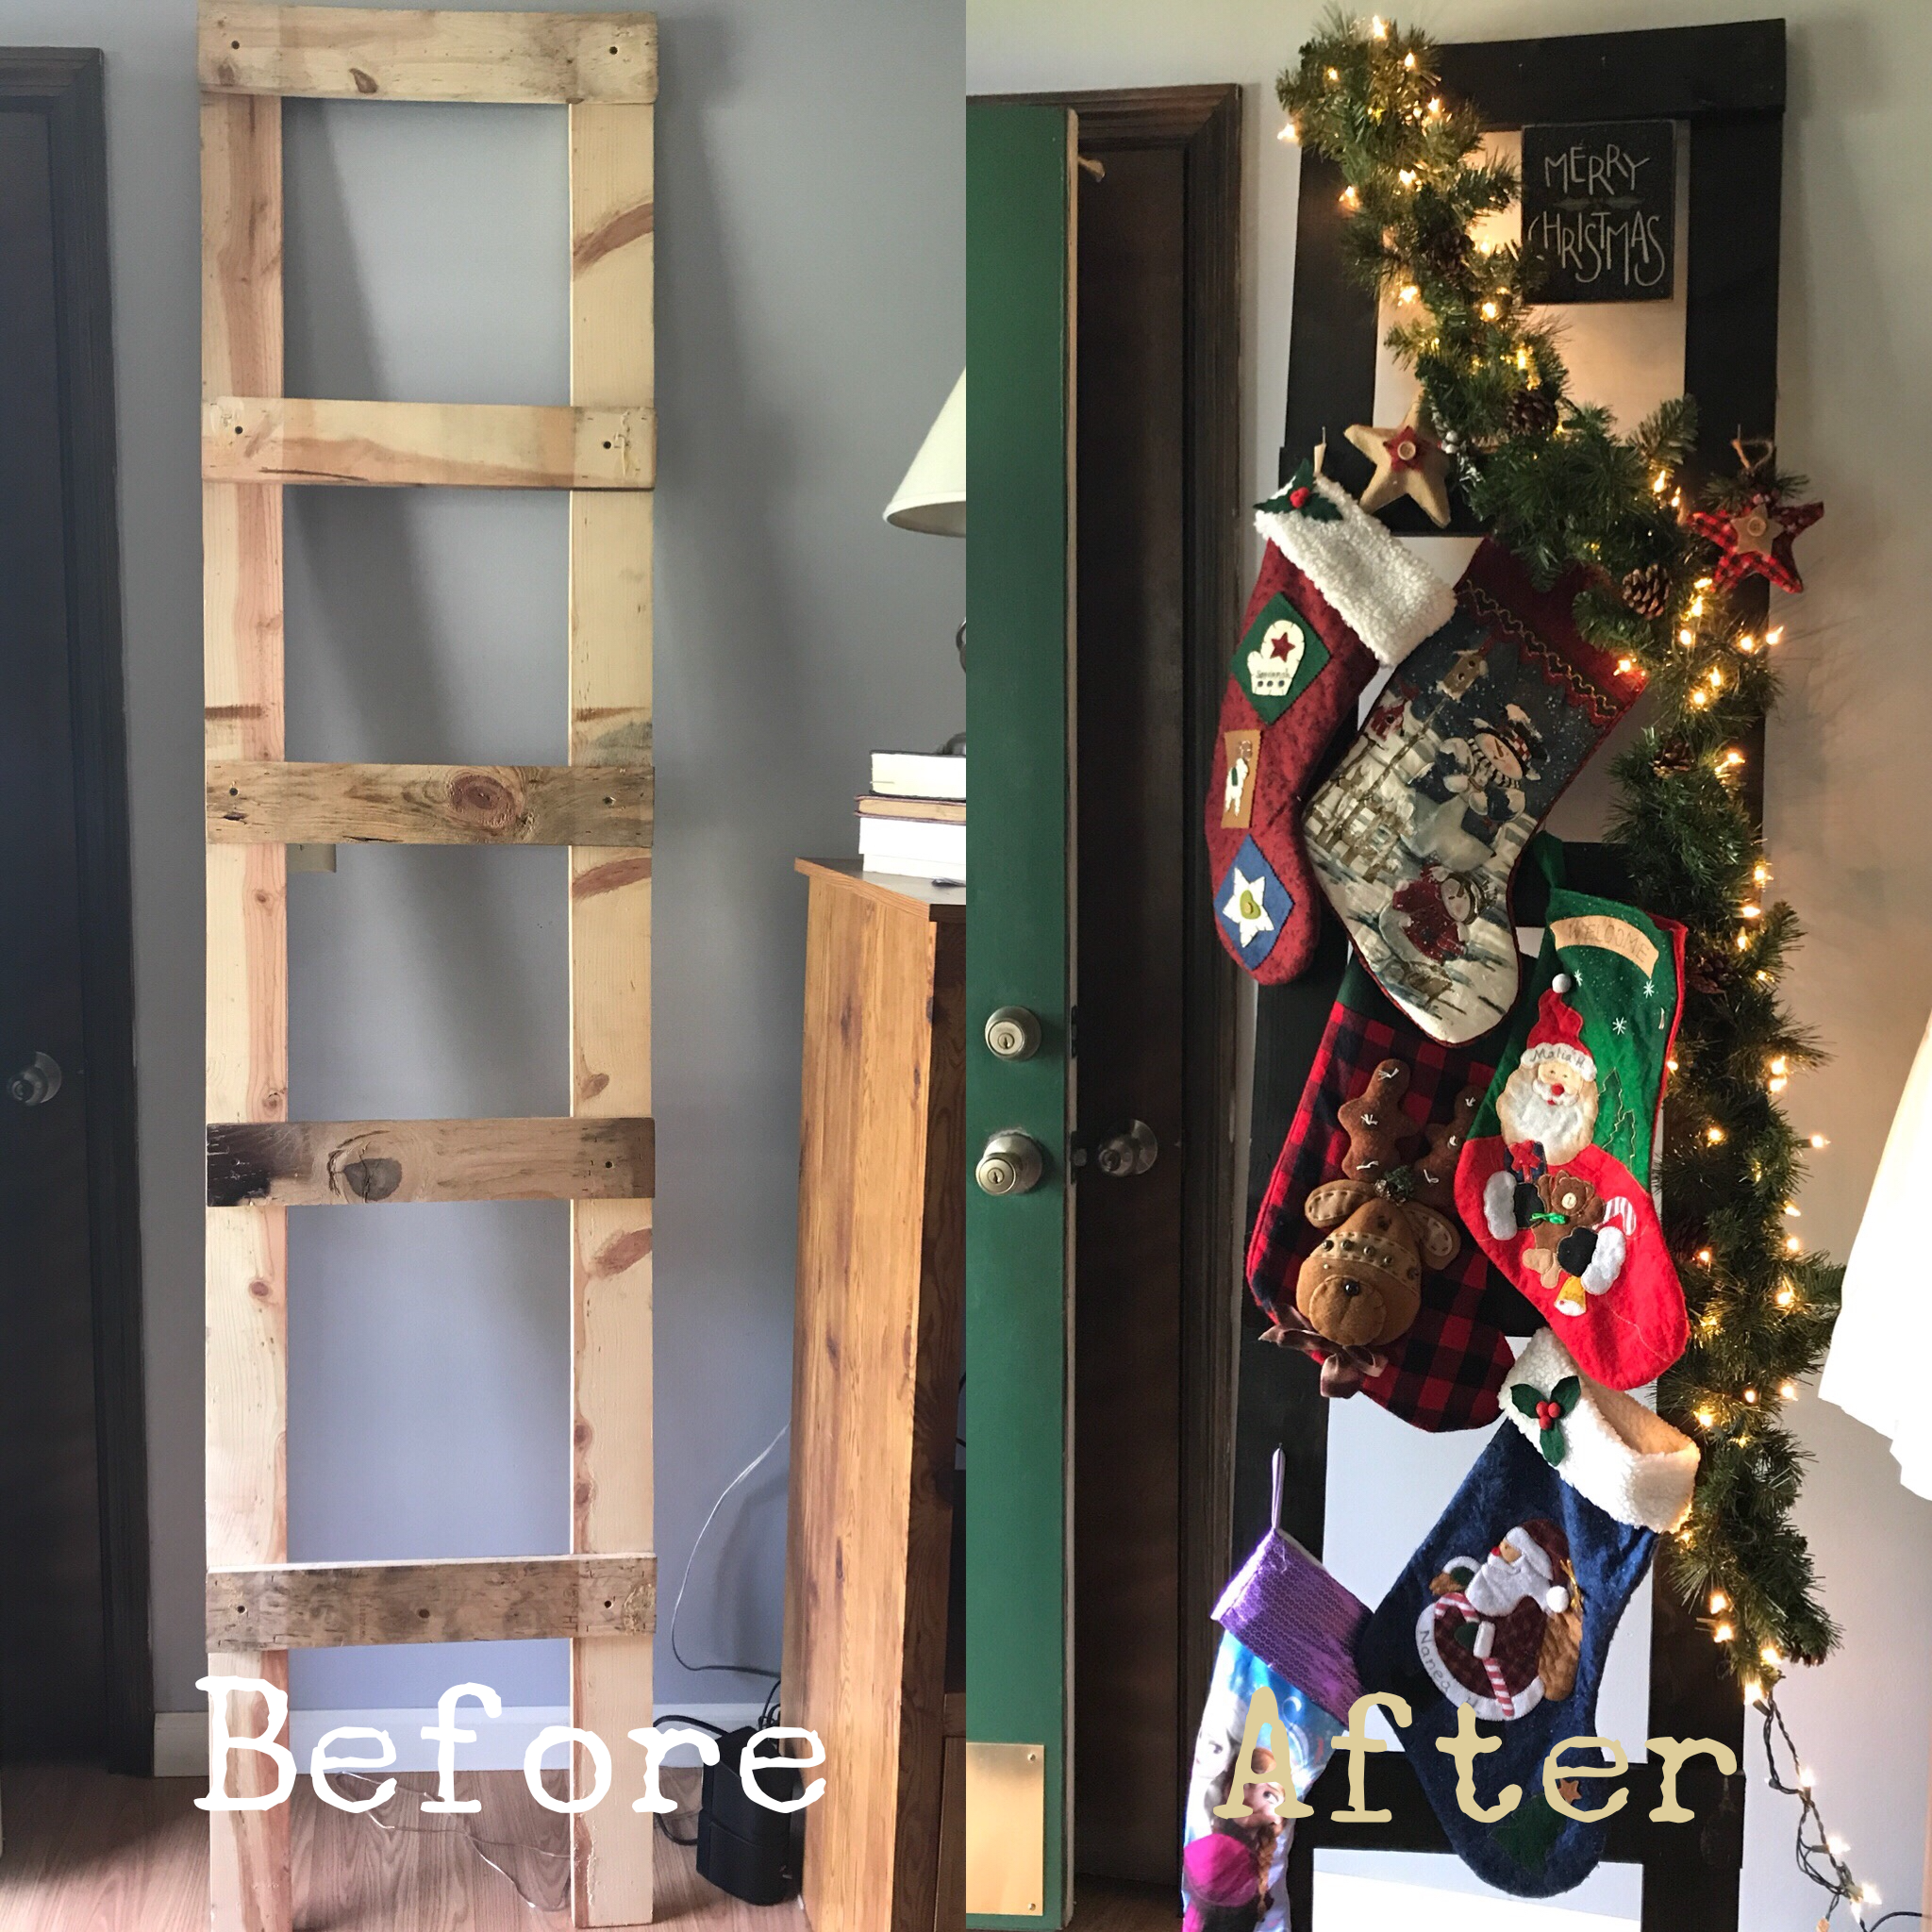 Pin By Nalani Haruo On Holiday Ideas Christmas Crafts Ladder Decor Christmas Stockings